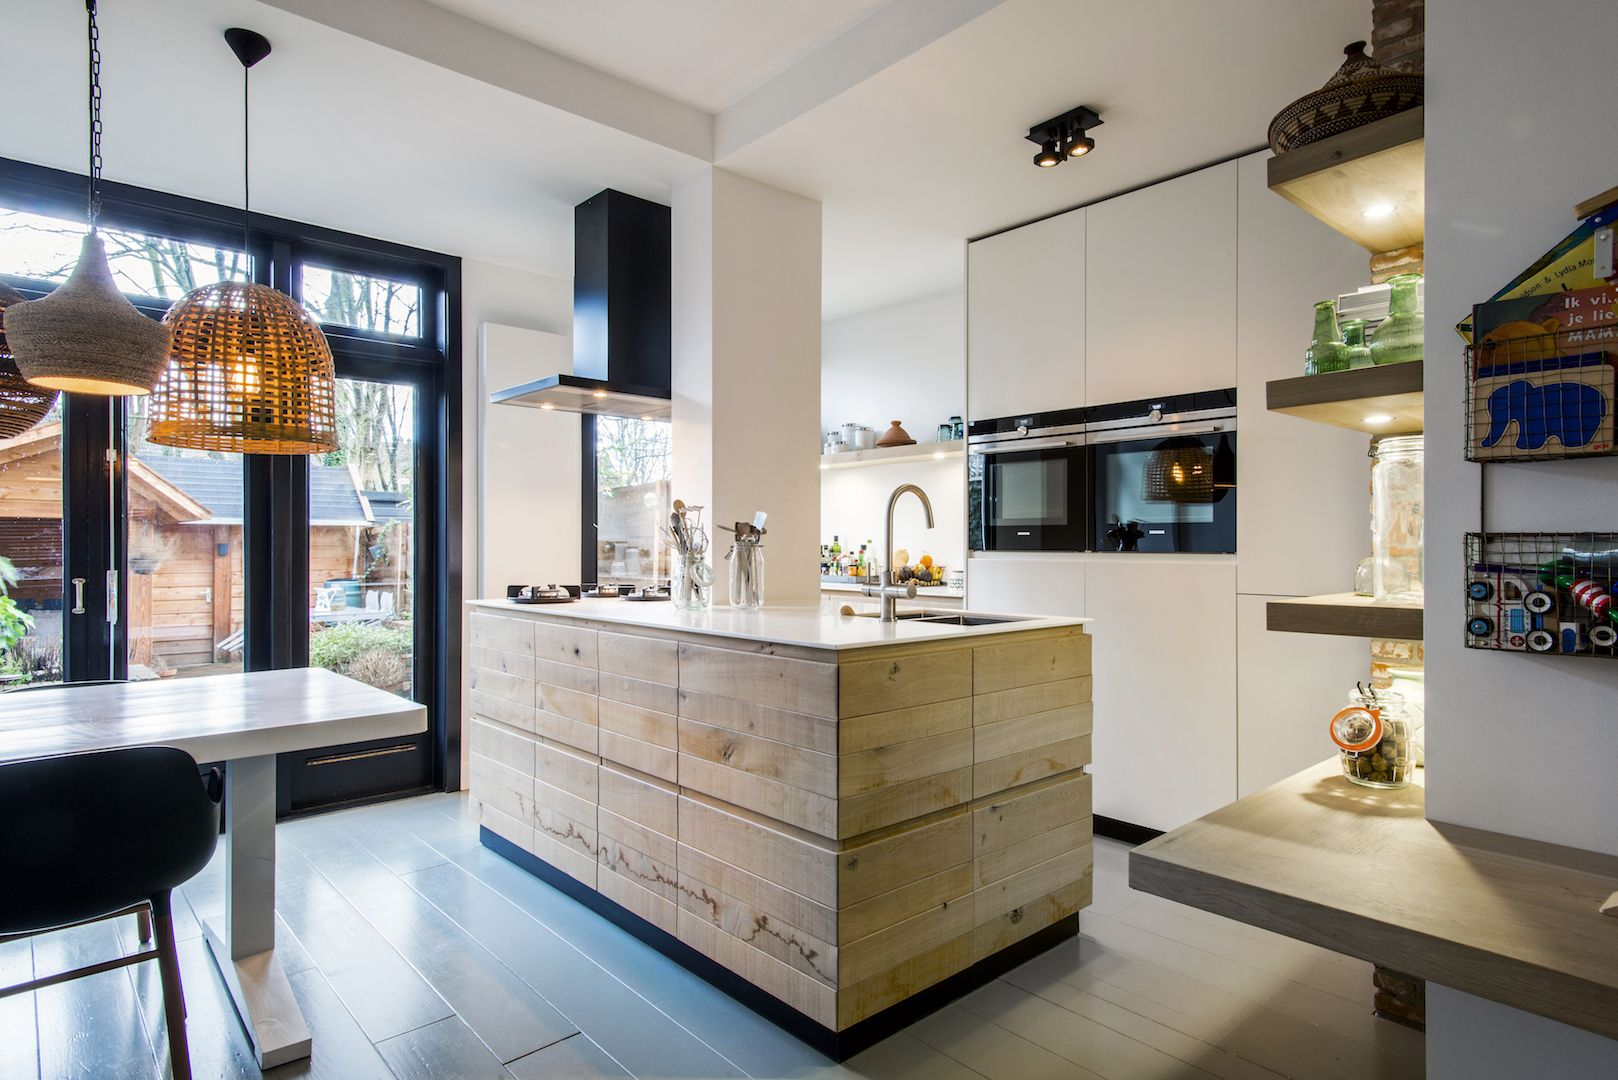 Minimalistisch Interieur Serre : Jp walker minimalistische ruw houten keuken keukens hout modern